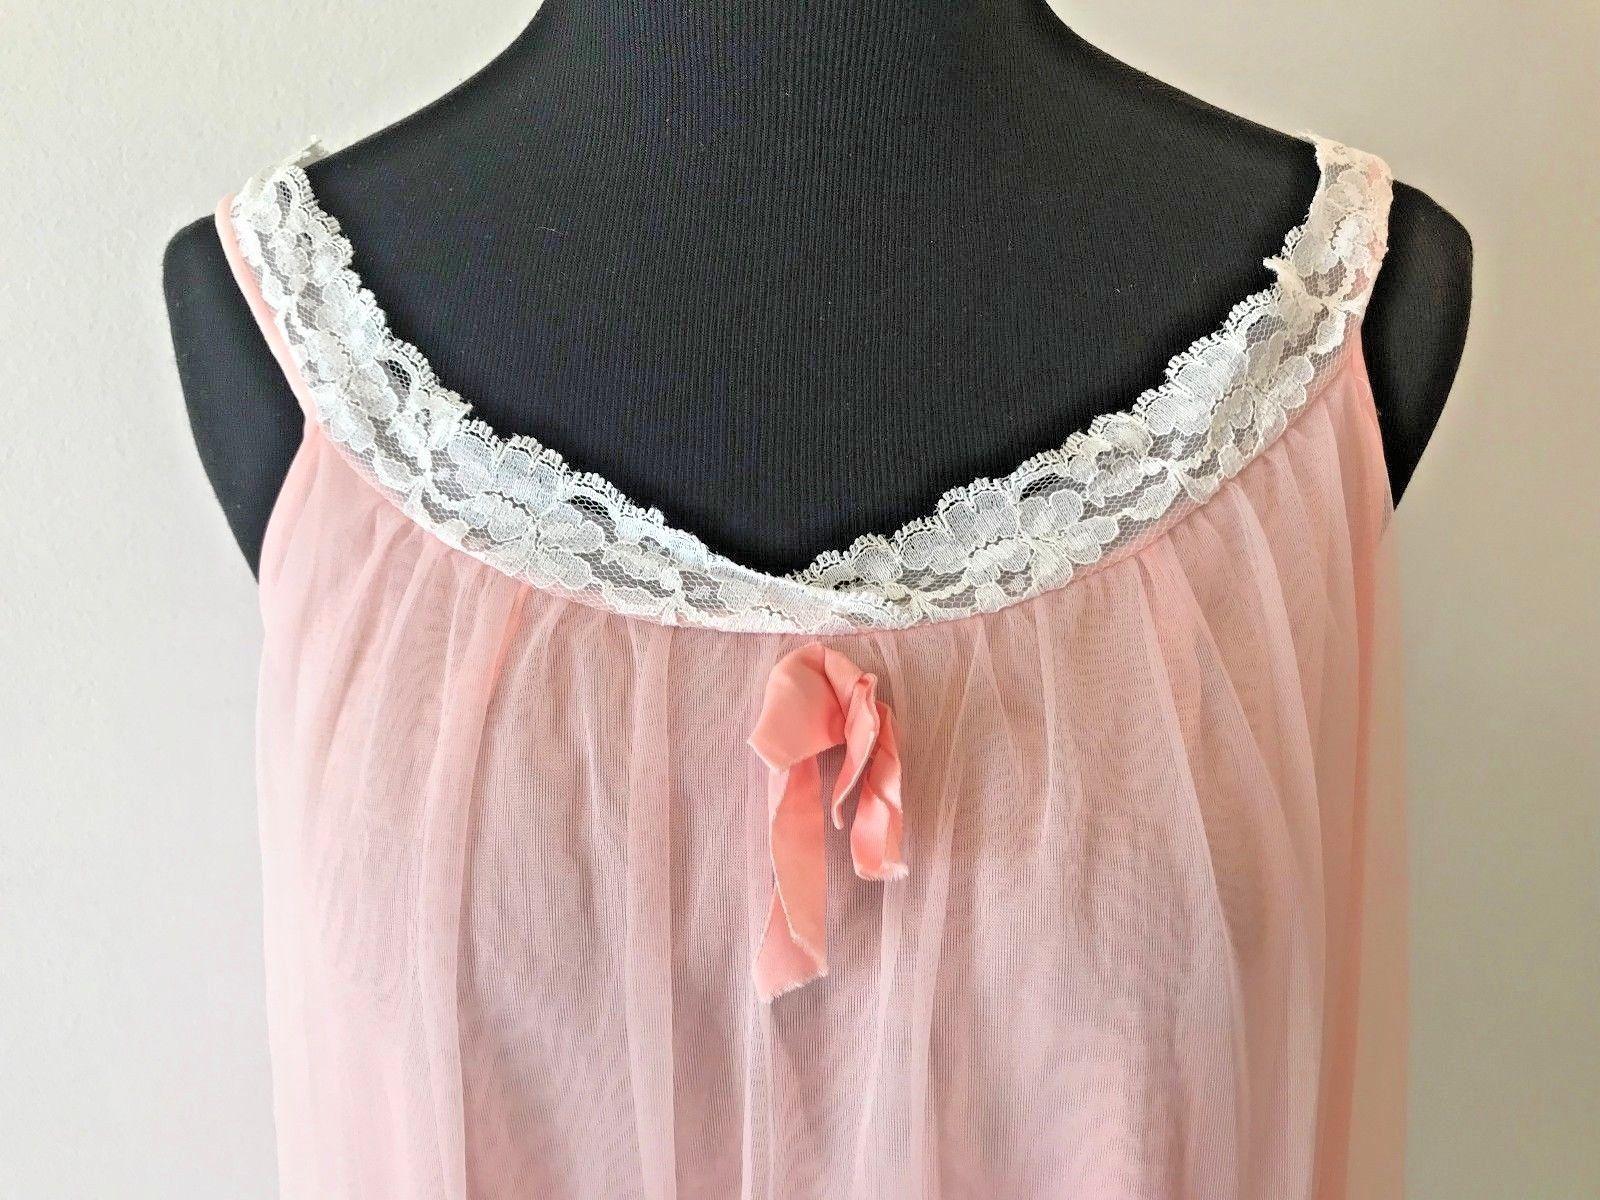 Vintage 1960s Sears Peignoir Nightgown Robe Set Chiffon Pink size S M w  Flaw AC 4f0c7a3af